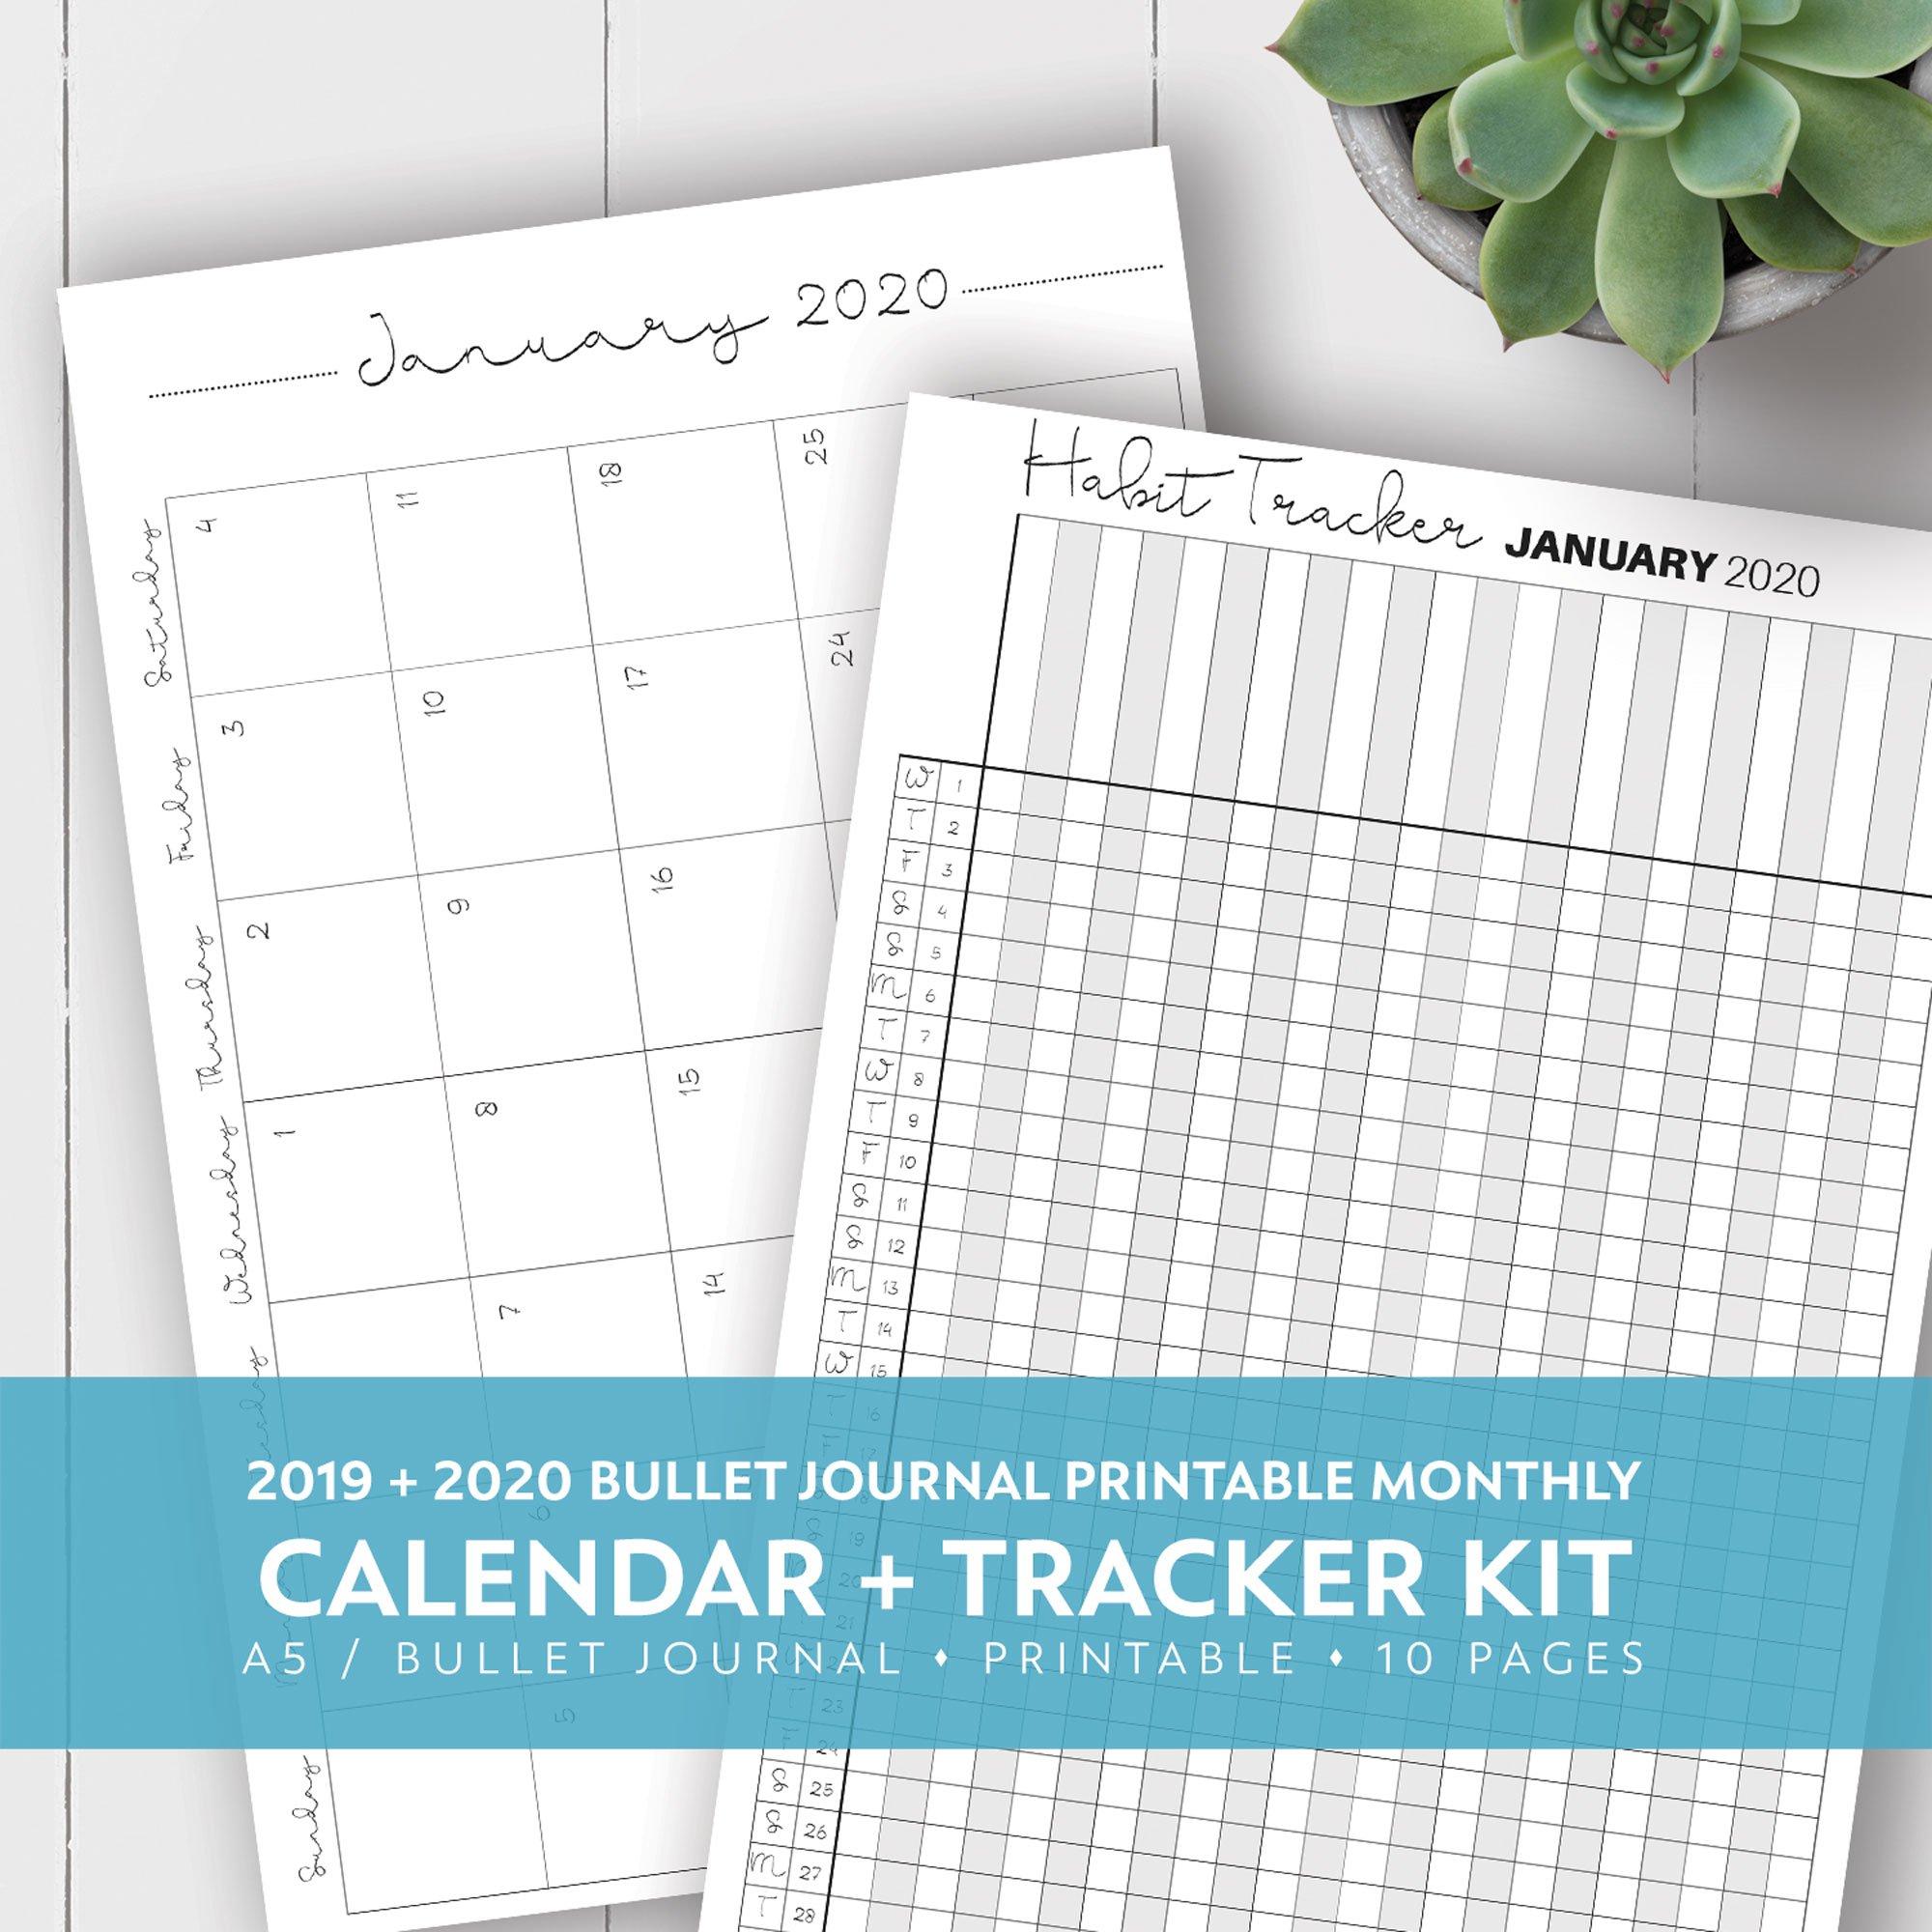 2020 Calendar For 5.5 X 8.5 | Calendar Template Printable 8.5 X 5.5 Calendar Printable